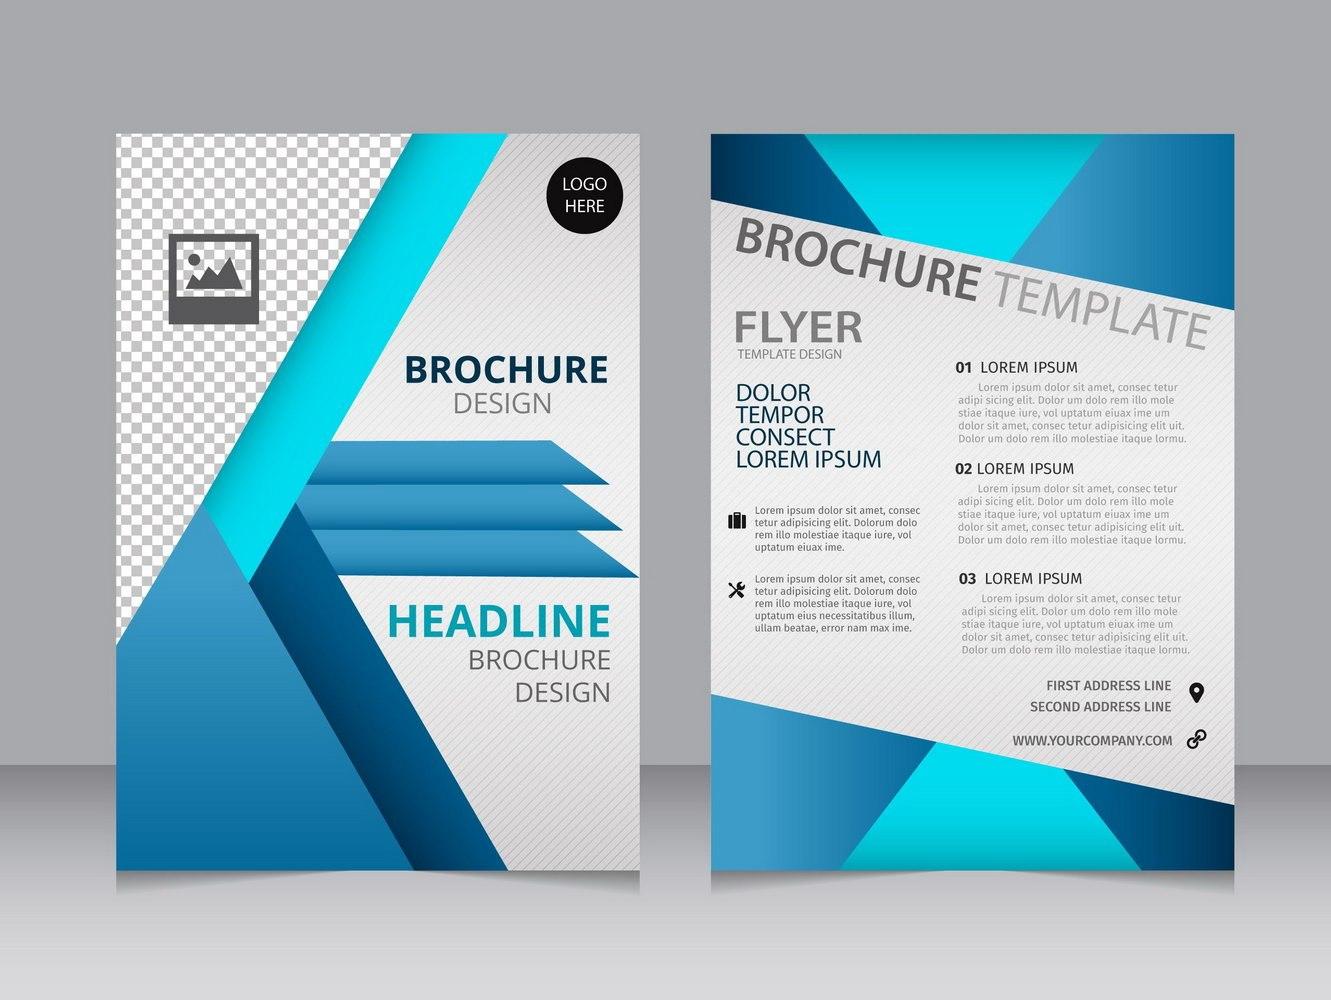 Blank Brochure Templates Free Download Word Template In Microsoft Word Brochure Template Free